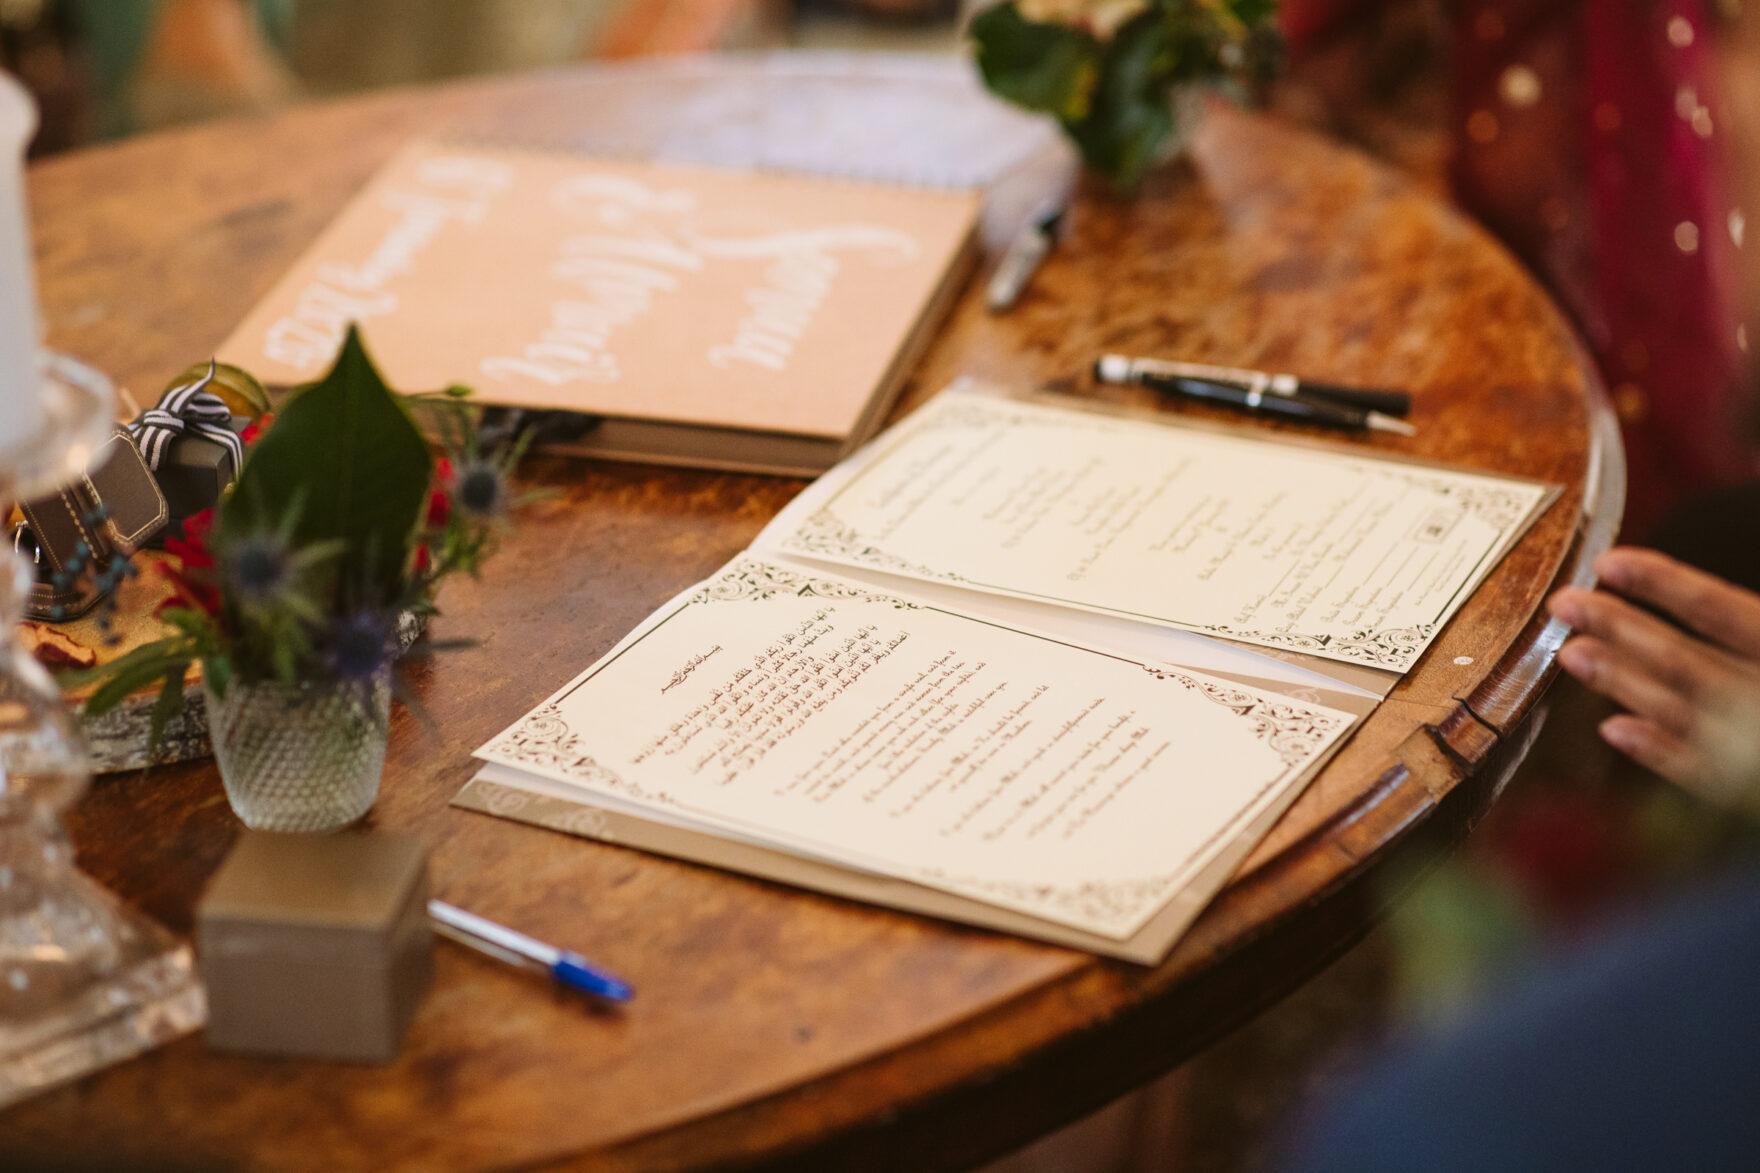 Islamic Marriage documents ata Muslim wedding in London